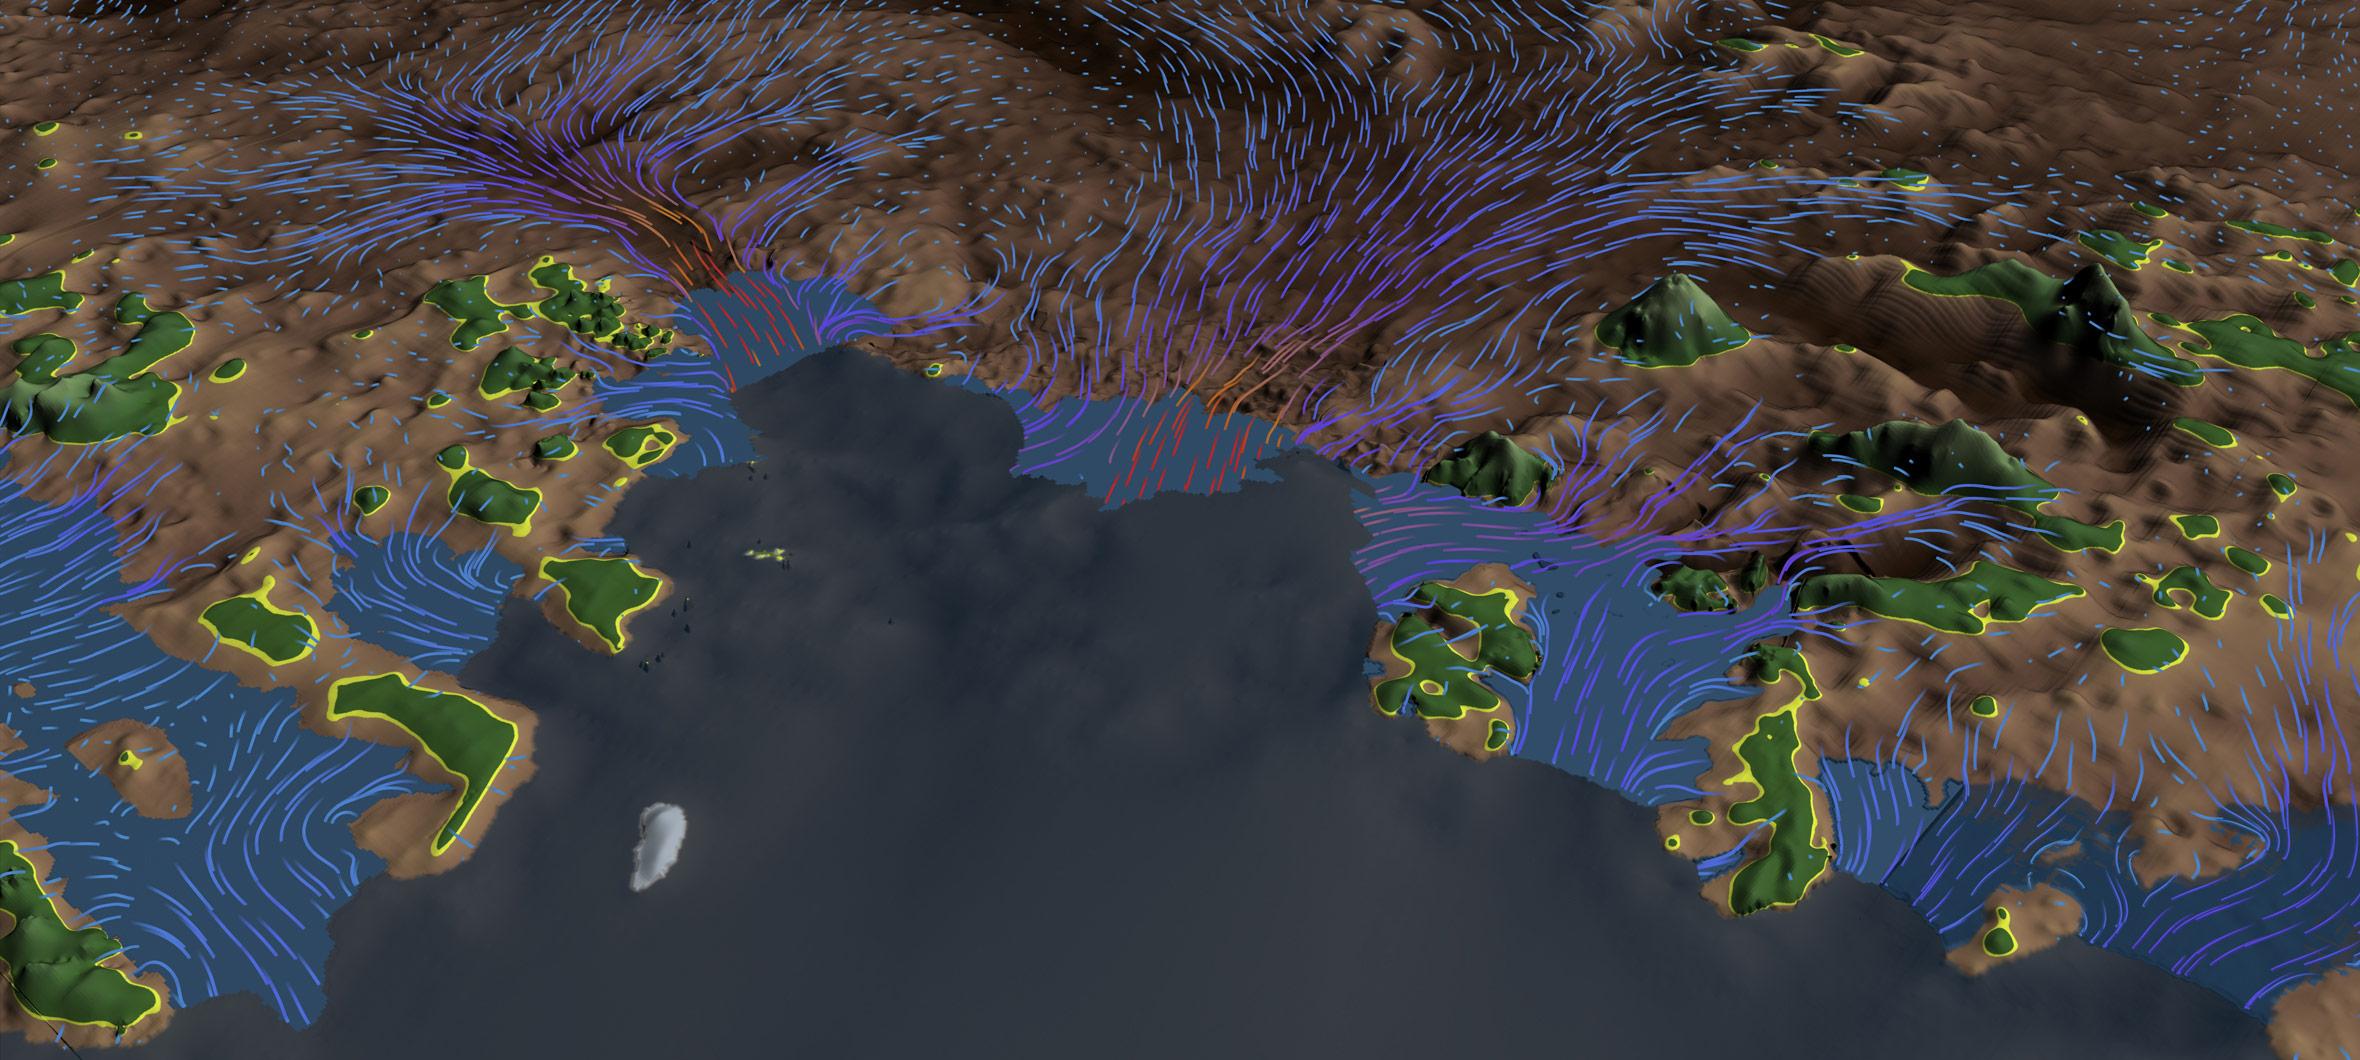 nasa-scientific-visualization-west-antarctic-ice-sheet-computer-graphics.jpg